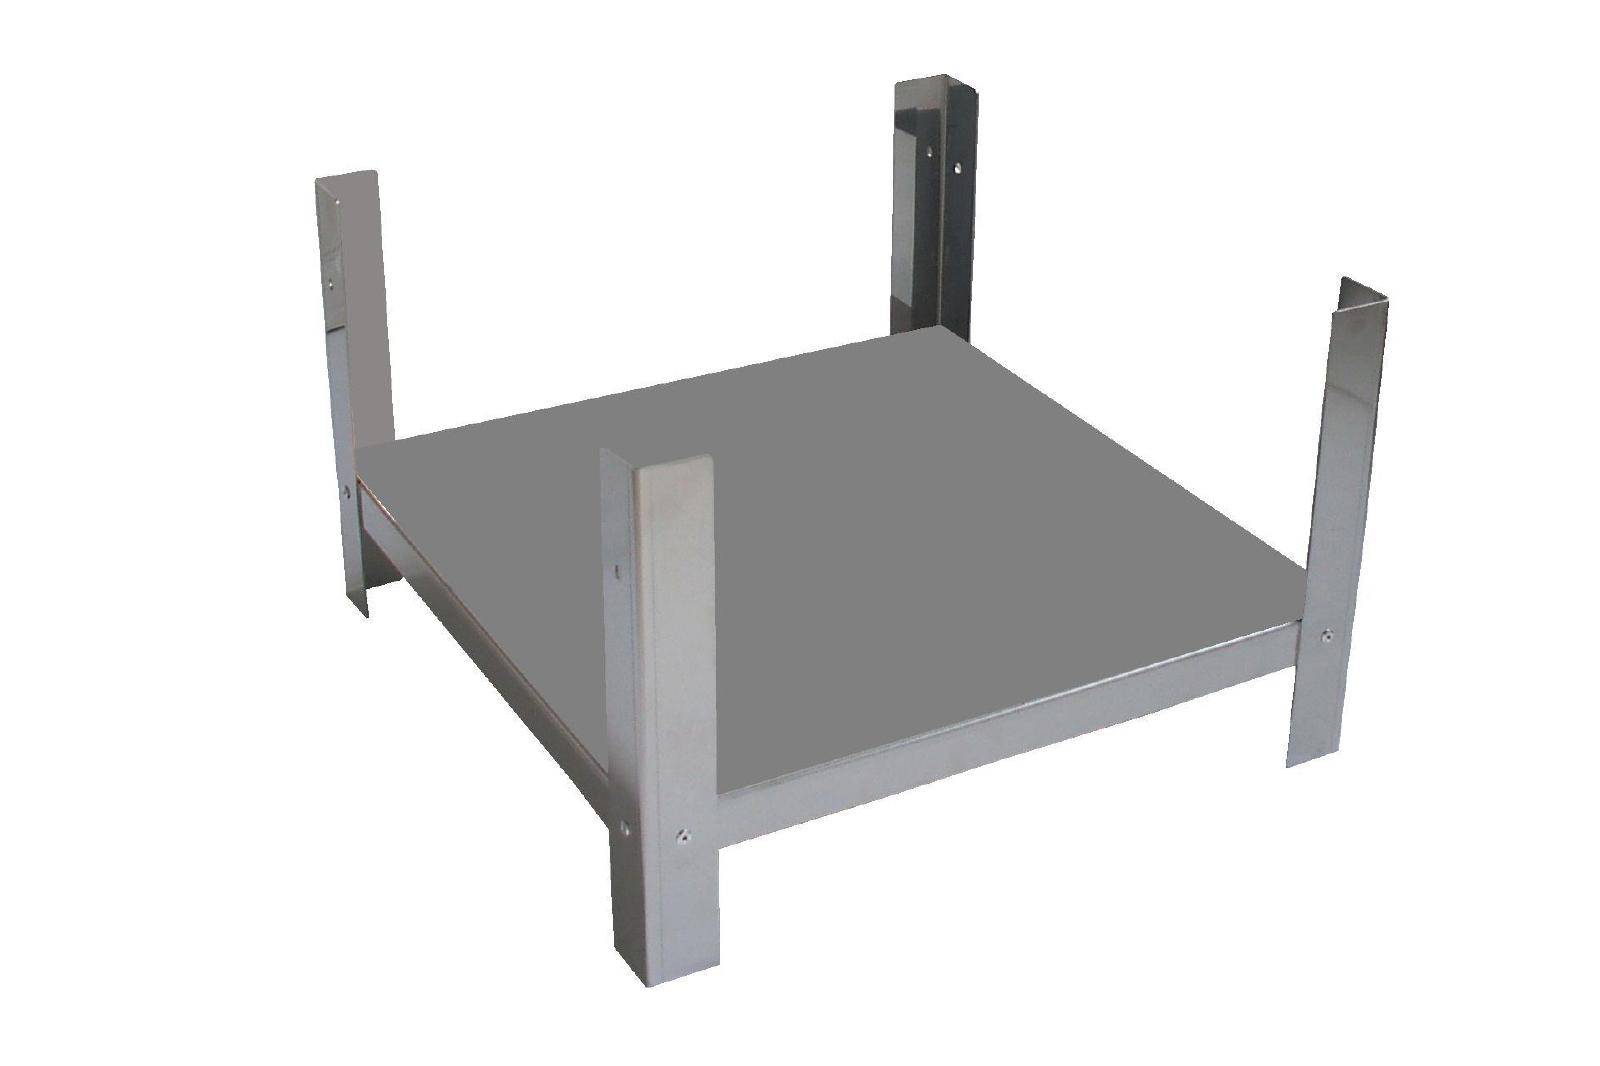 untergestell edelstahl f r hockerkocher 12 kw gas shop. Black Bedroom Furniture Sets. Home Design Ideas